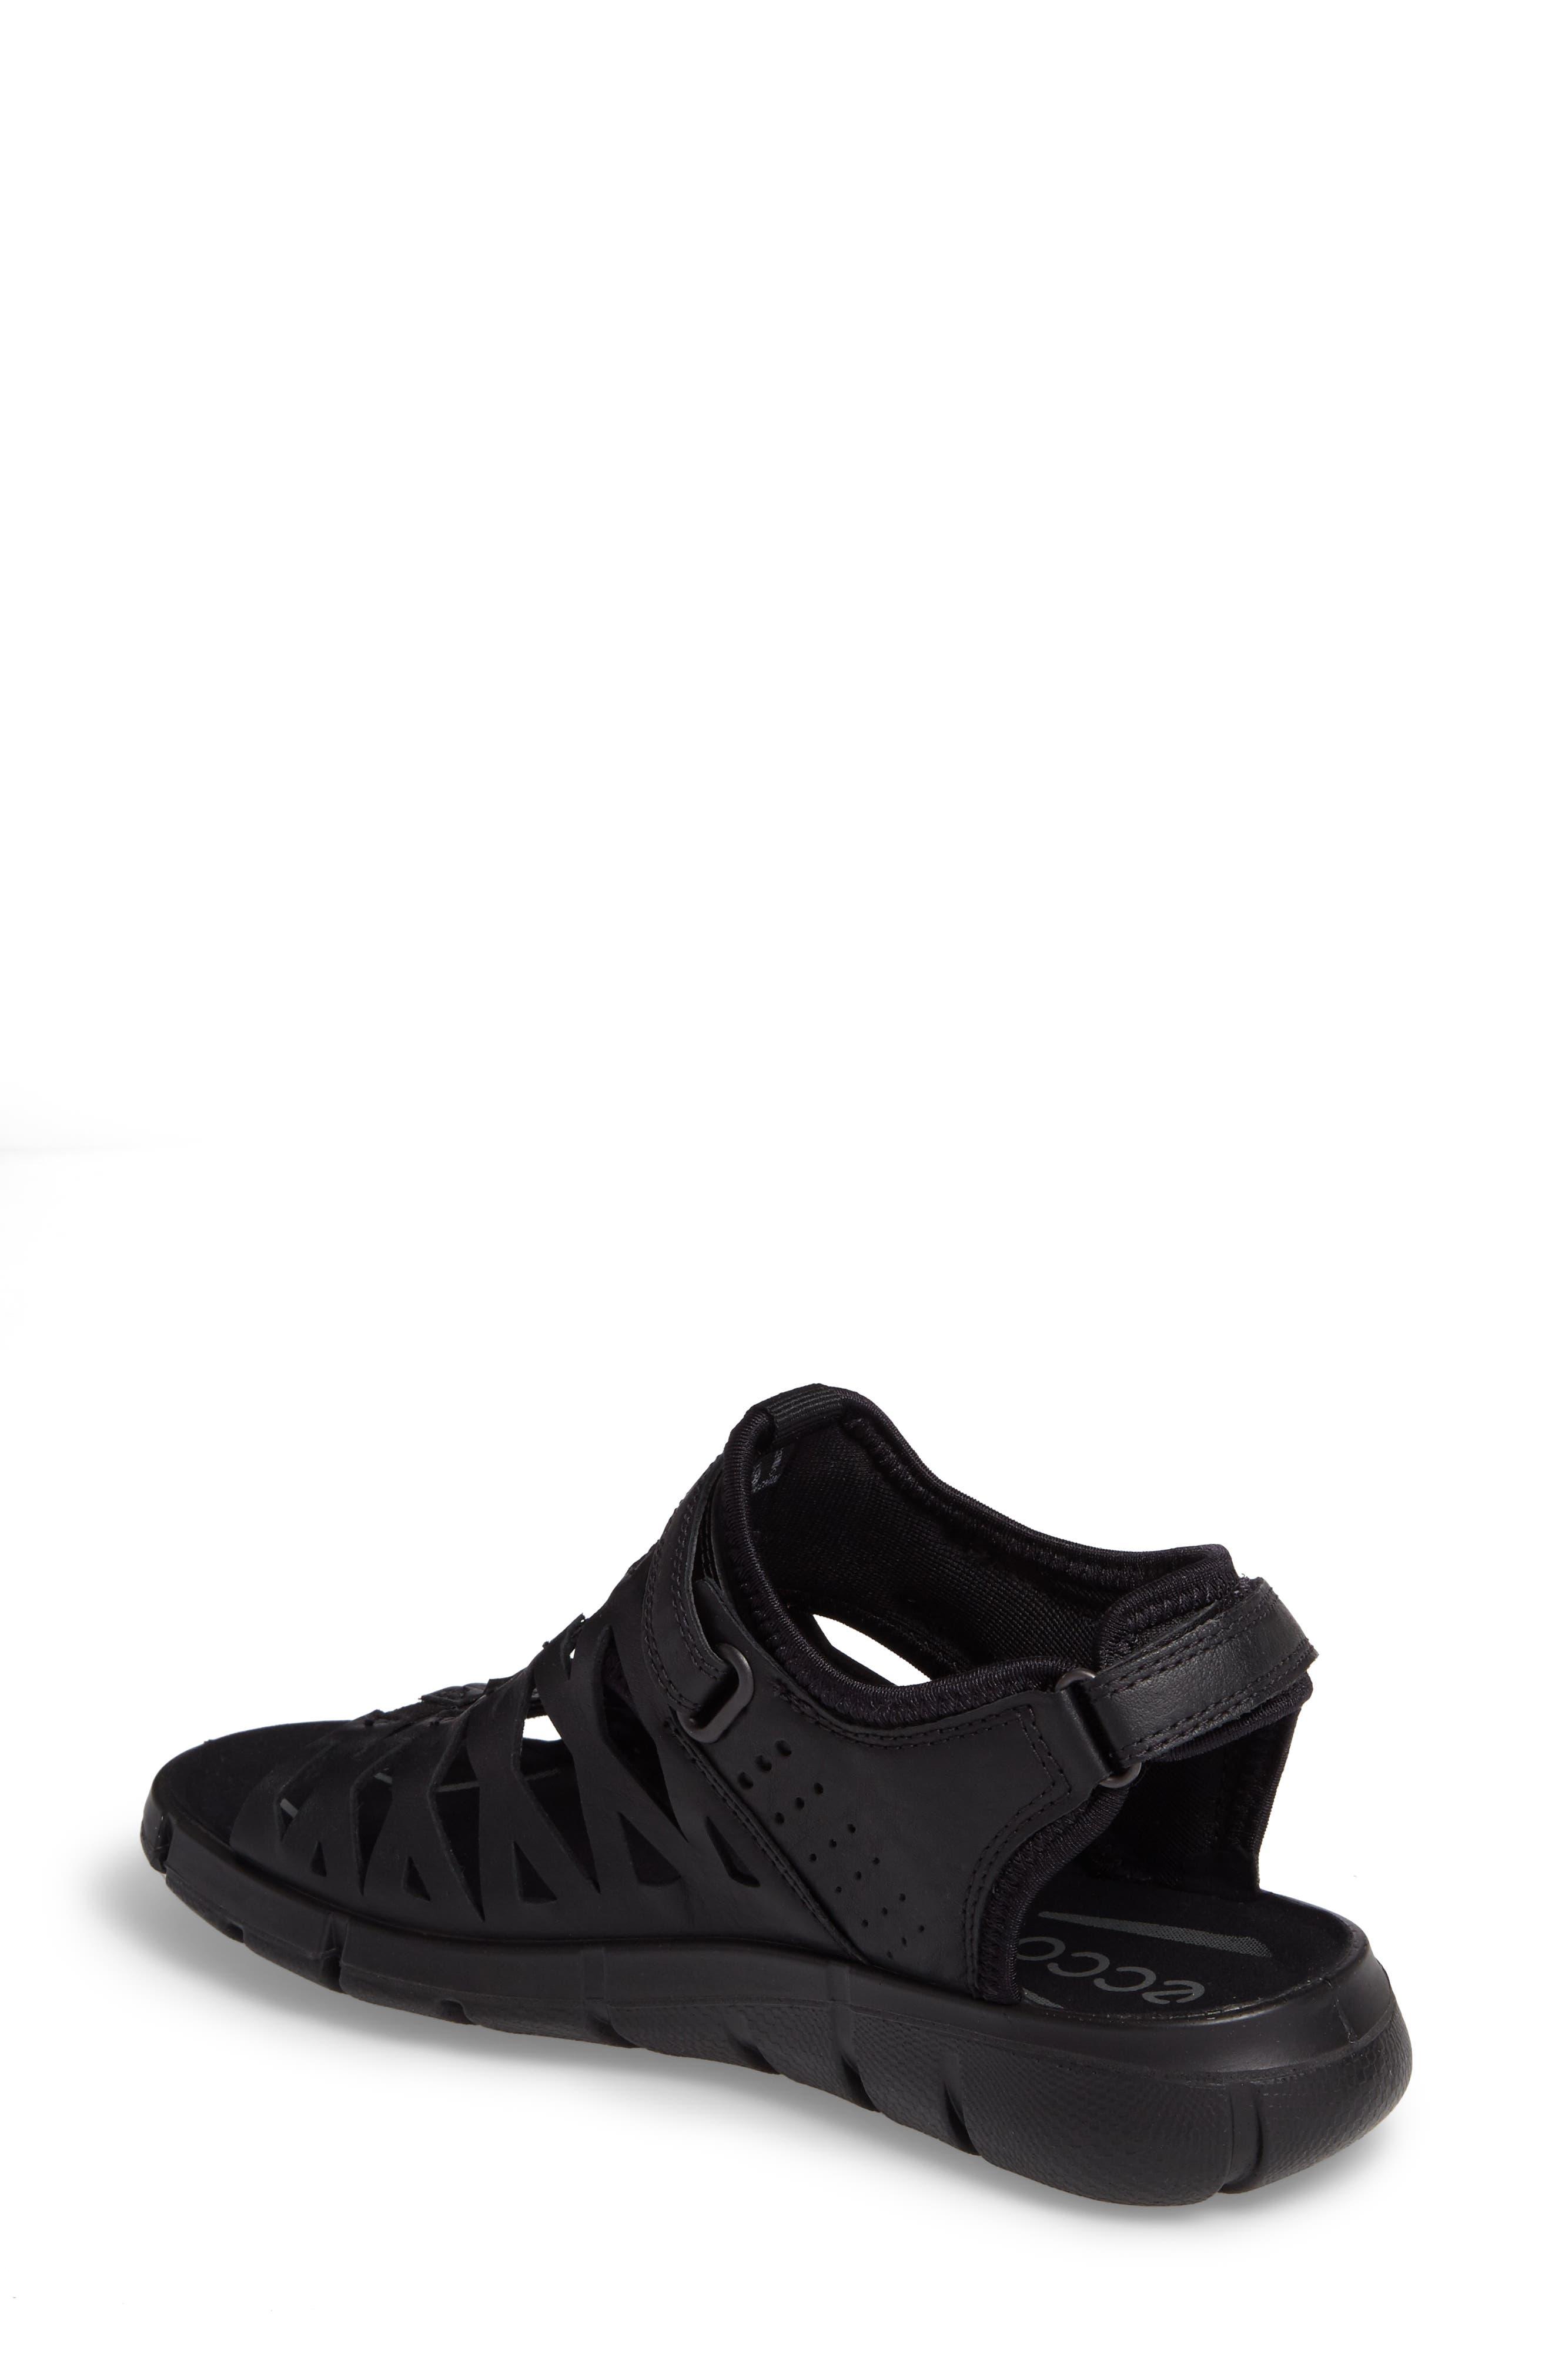 Alternate Image 2  - ECCO Intrinsic 2 Sandal (Women)